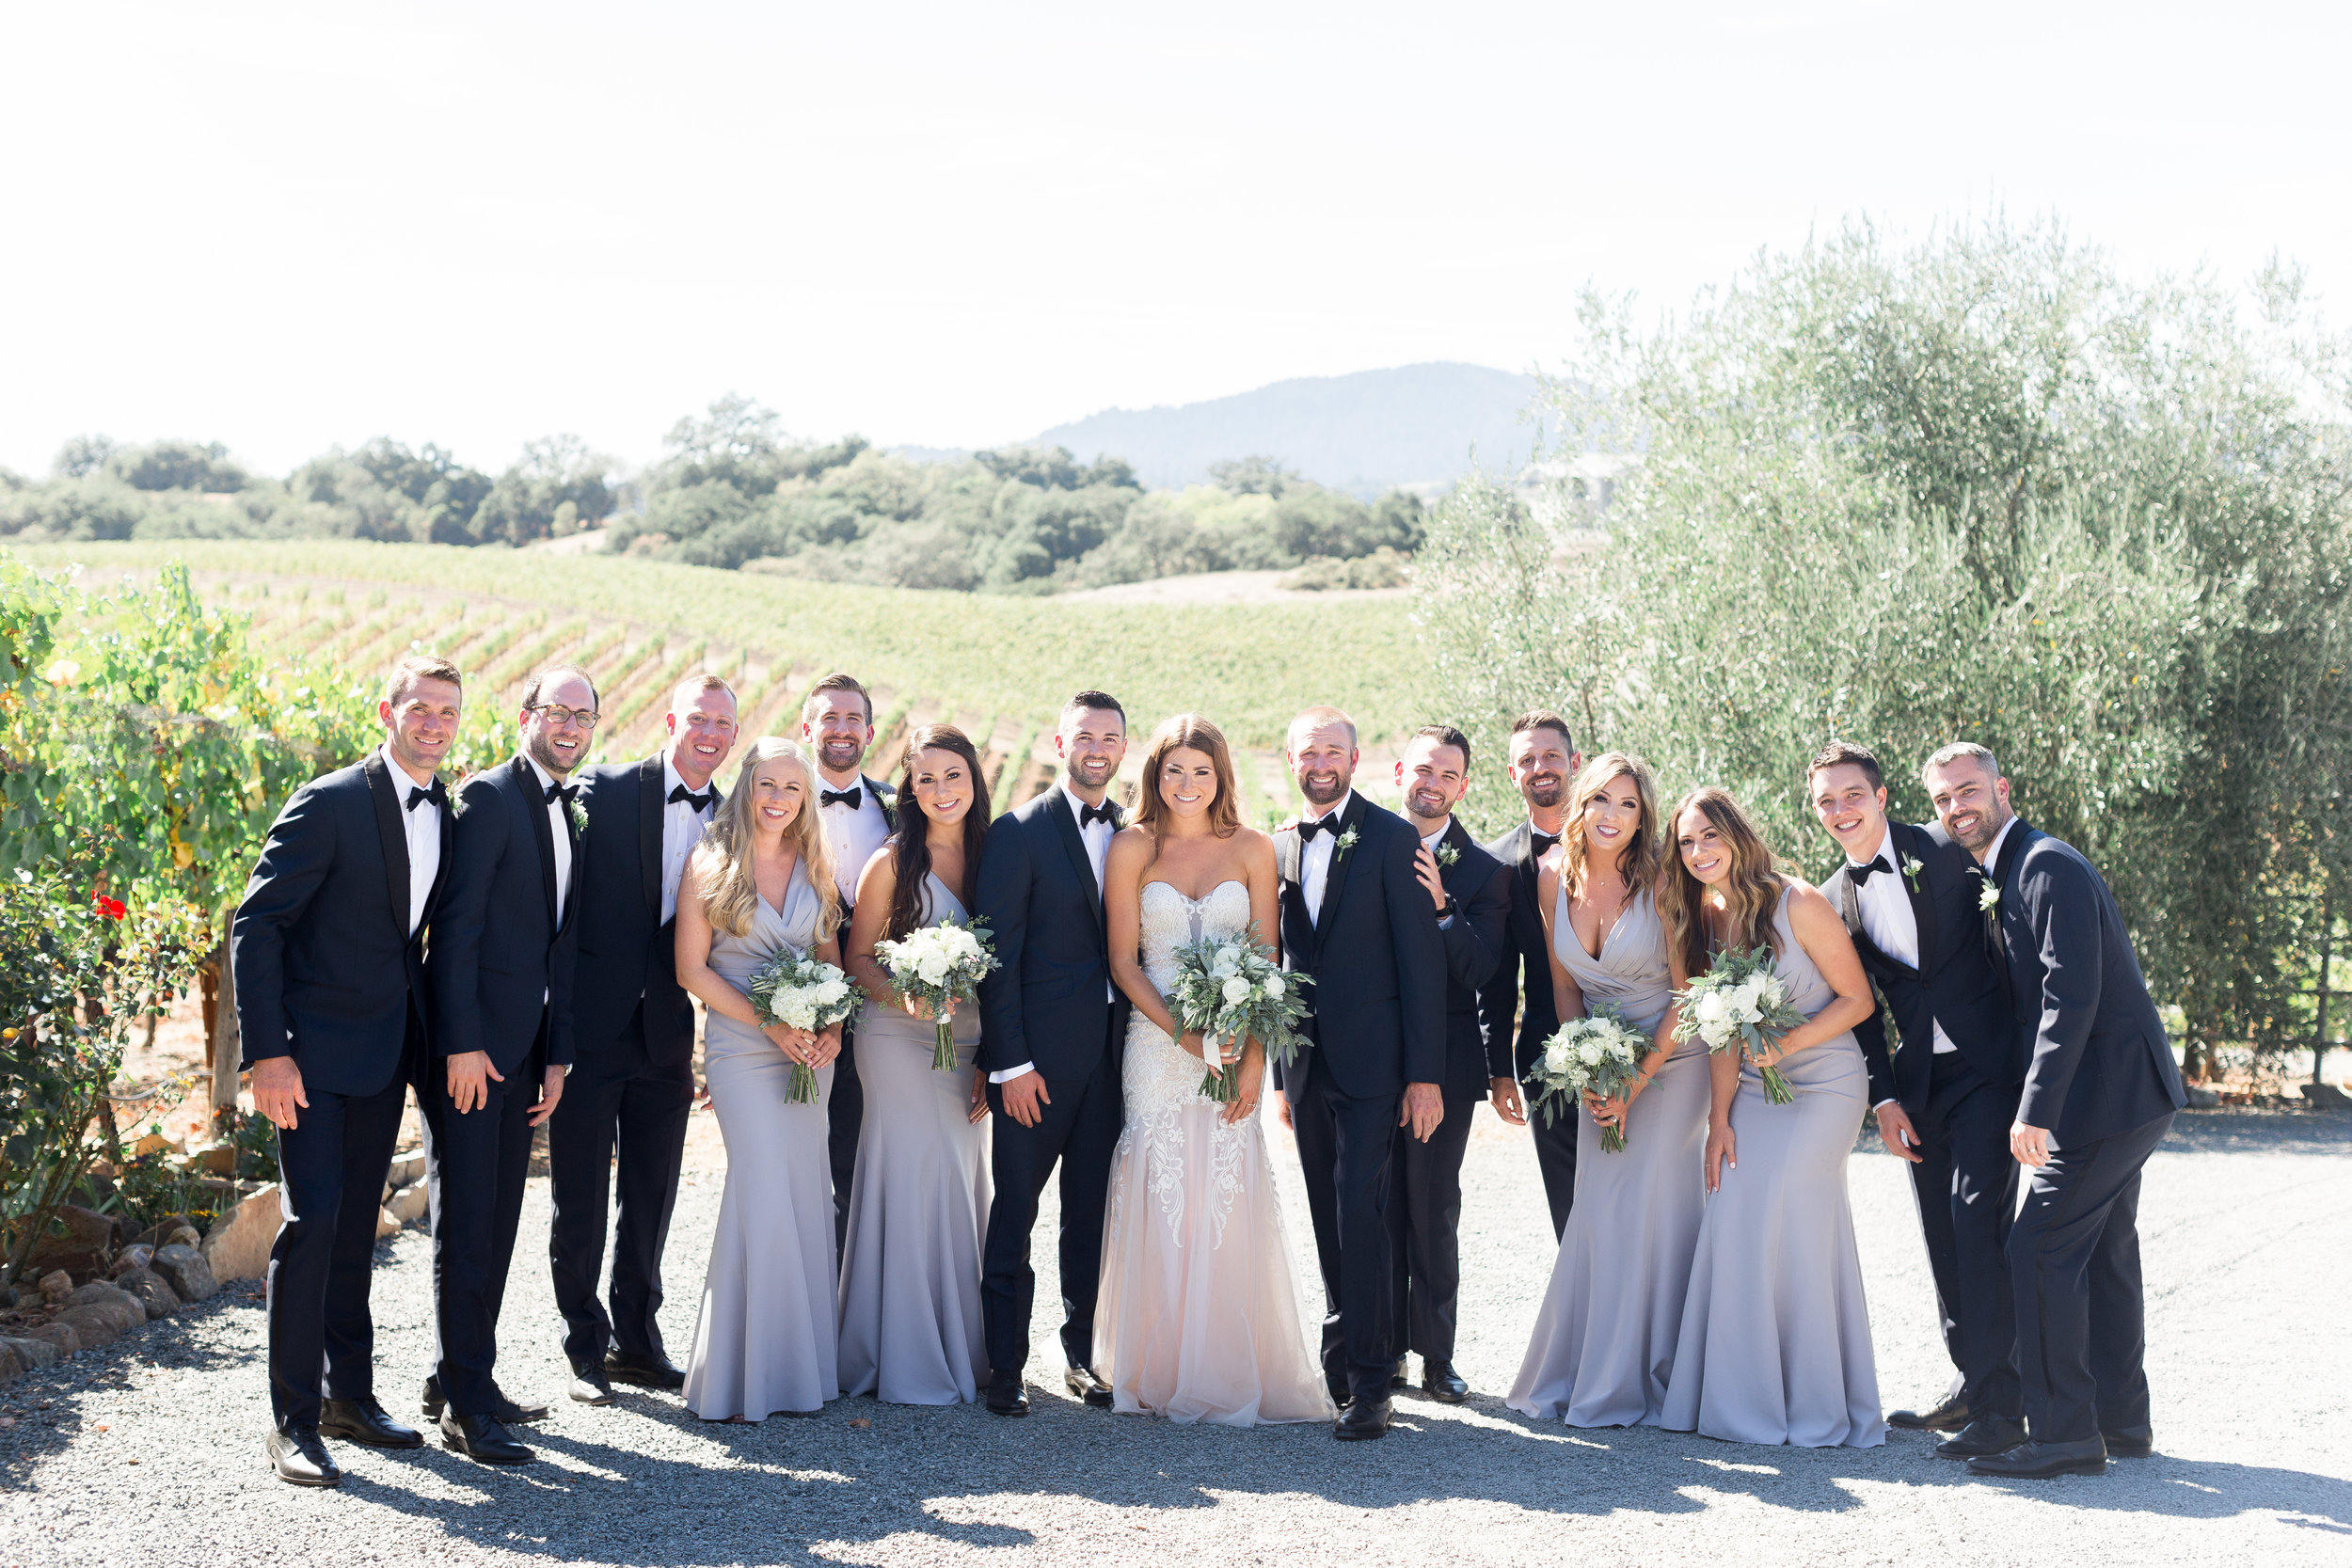 Calegari-Vineyards-Healdsburg-Wedding-Photographer (95 of 262).jpg